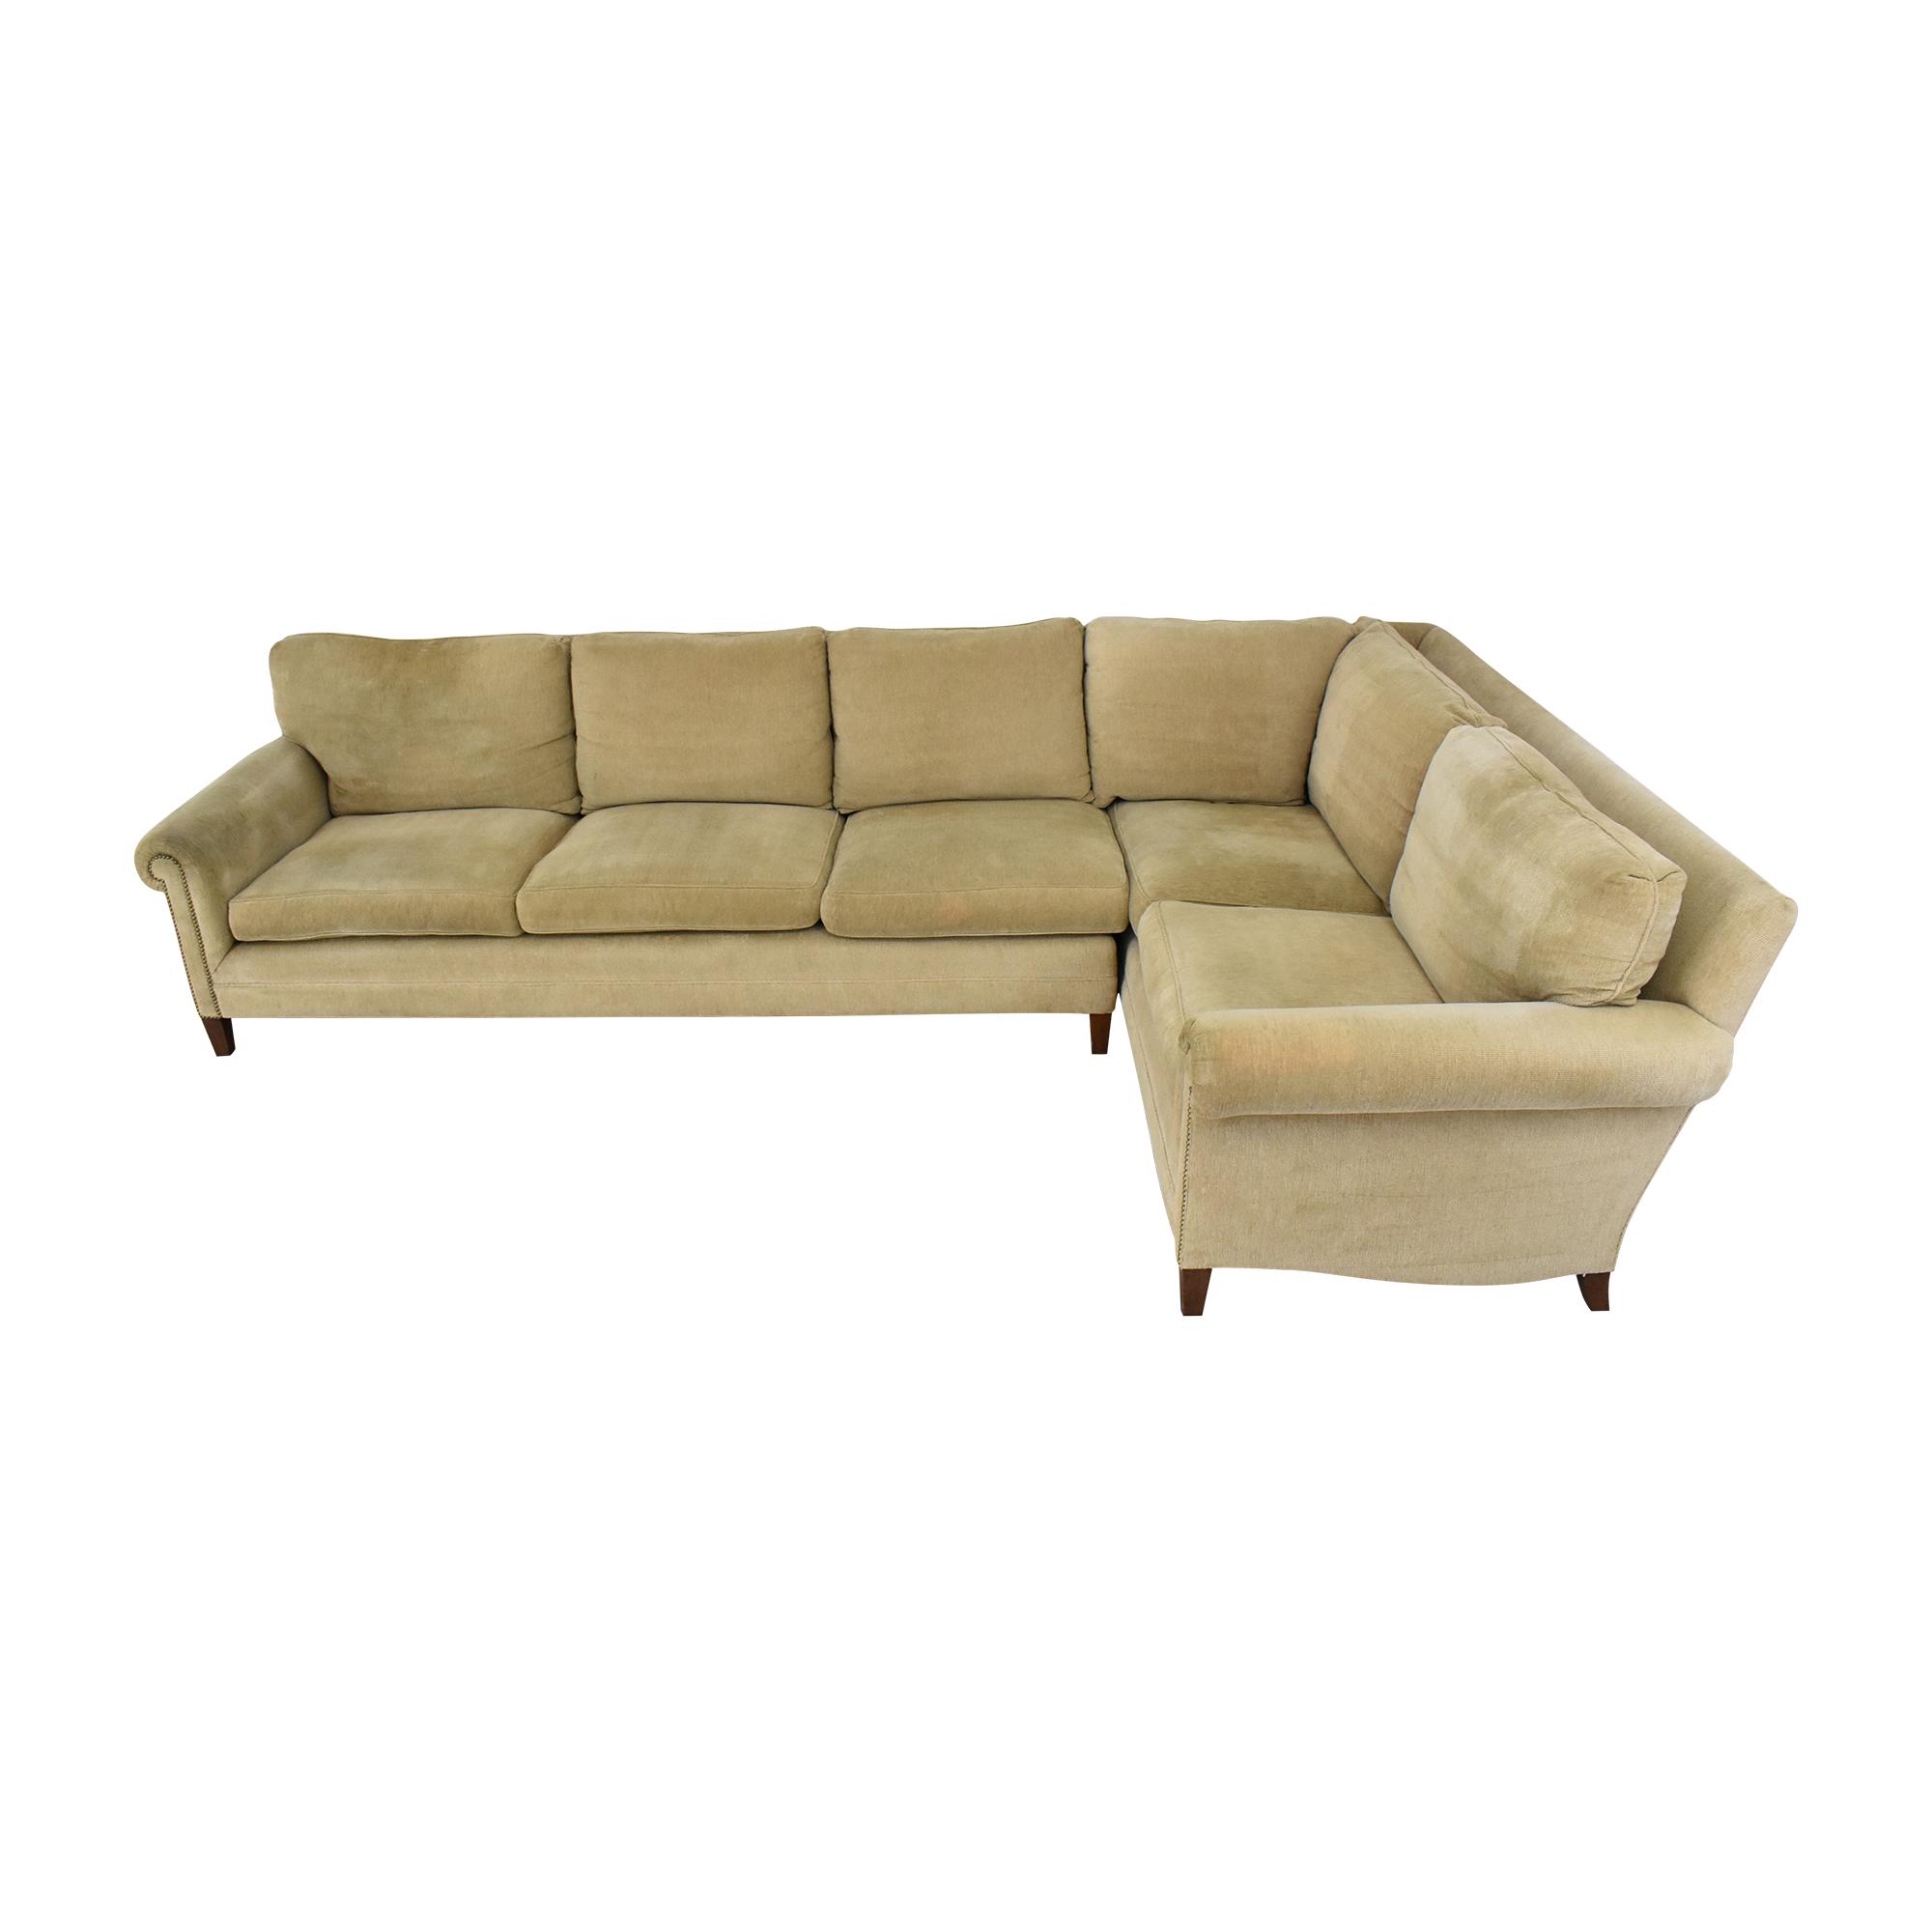 Custom L-Shaped Roll Arm Sectional Sofa discount